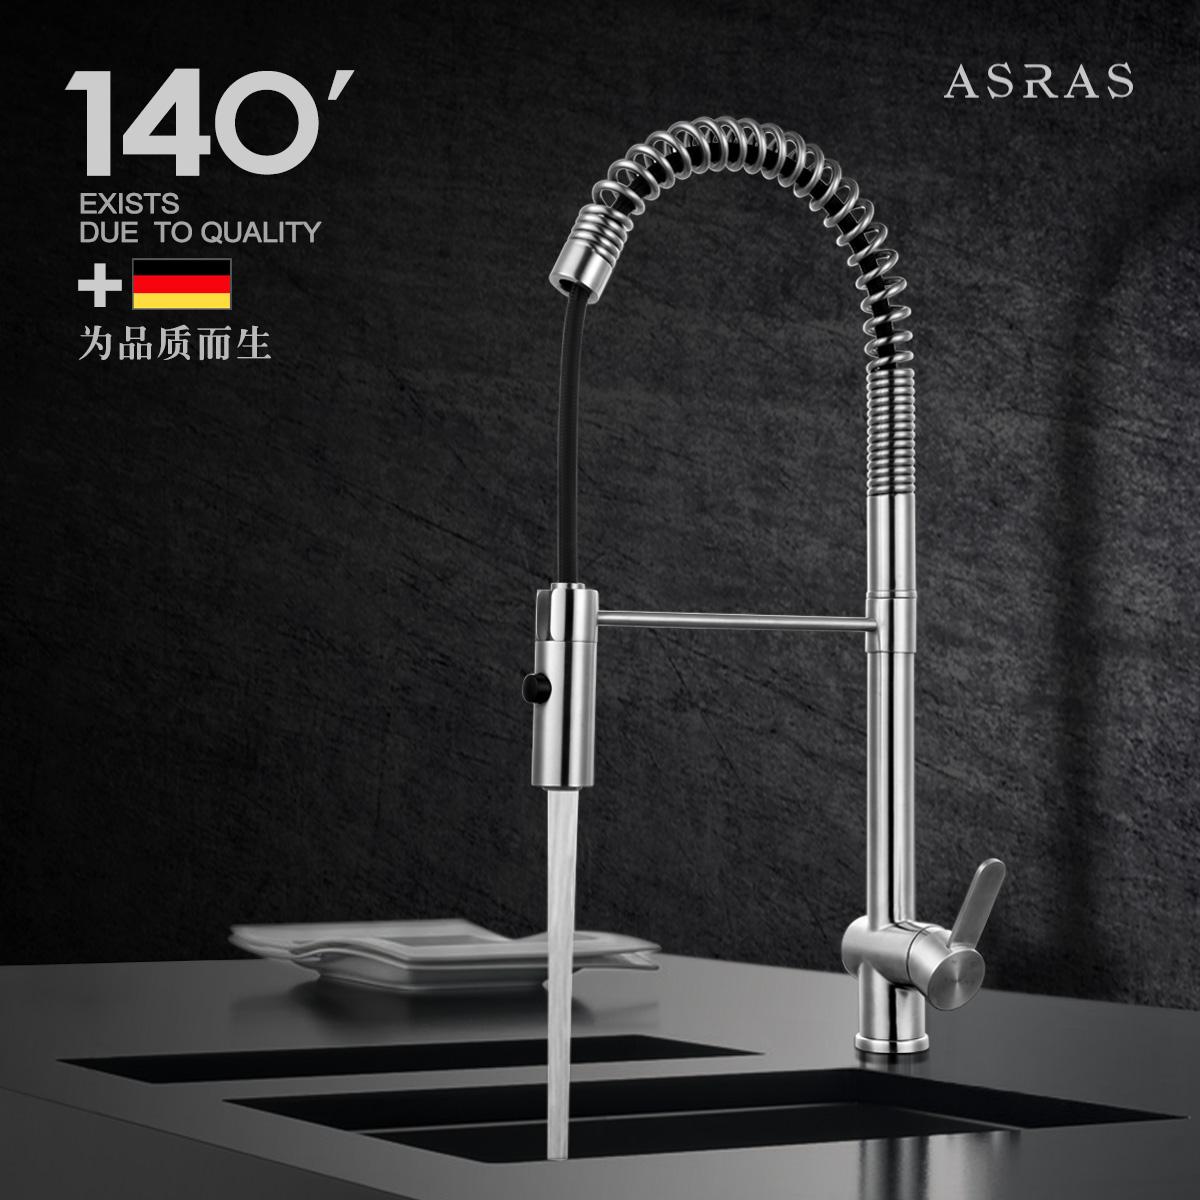 asras304不锈钢洗菜盆AS-3049